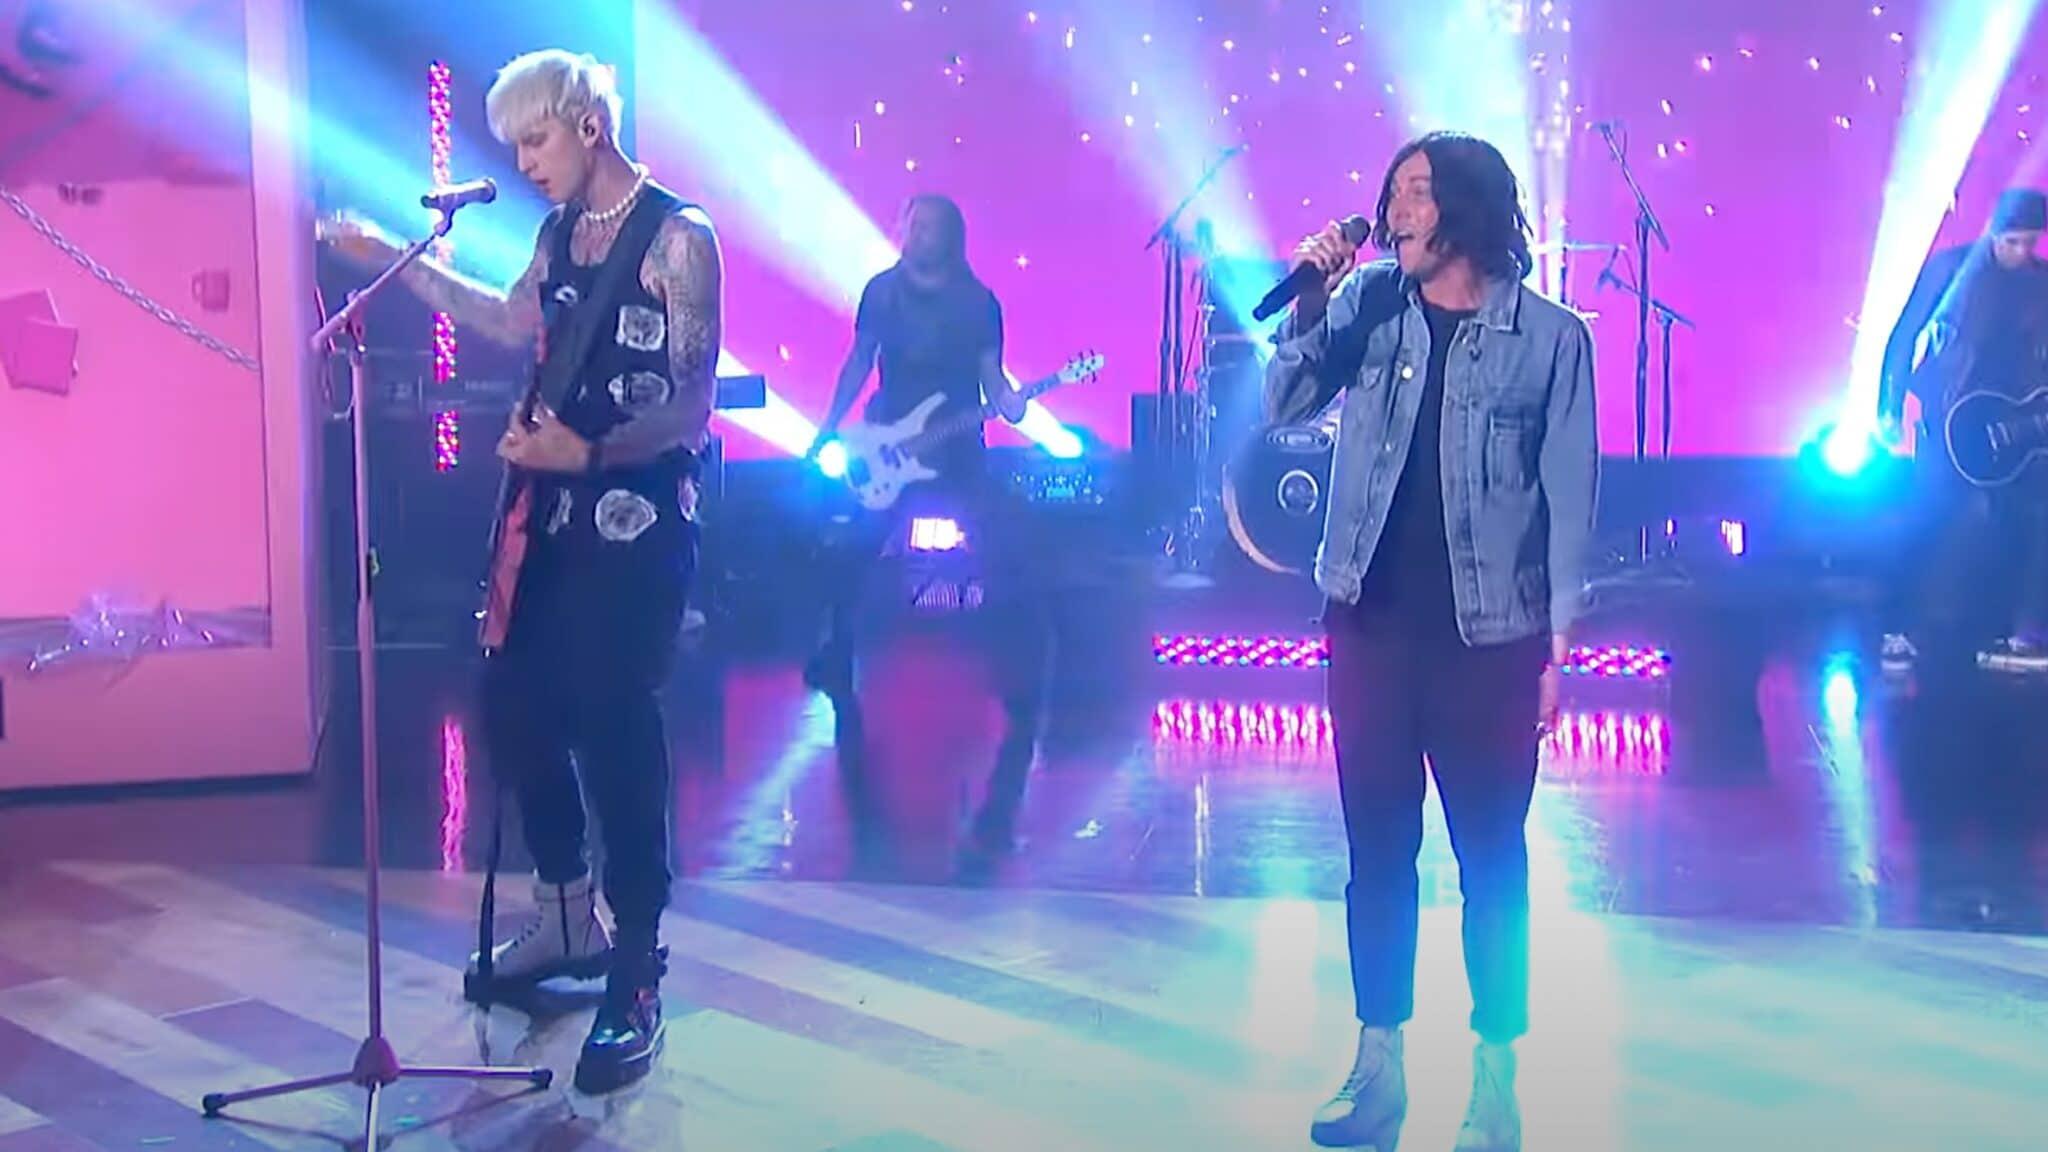 Machine Gun Kelly Kellin Quinn Sleeping With Sirens Blink-182 Travis Barker The Ellen Show Ellen DeGeneres